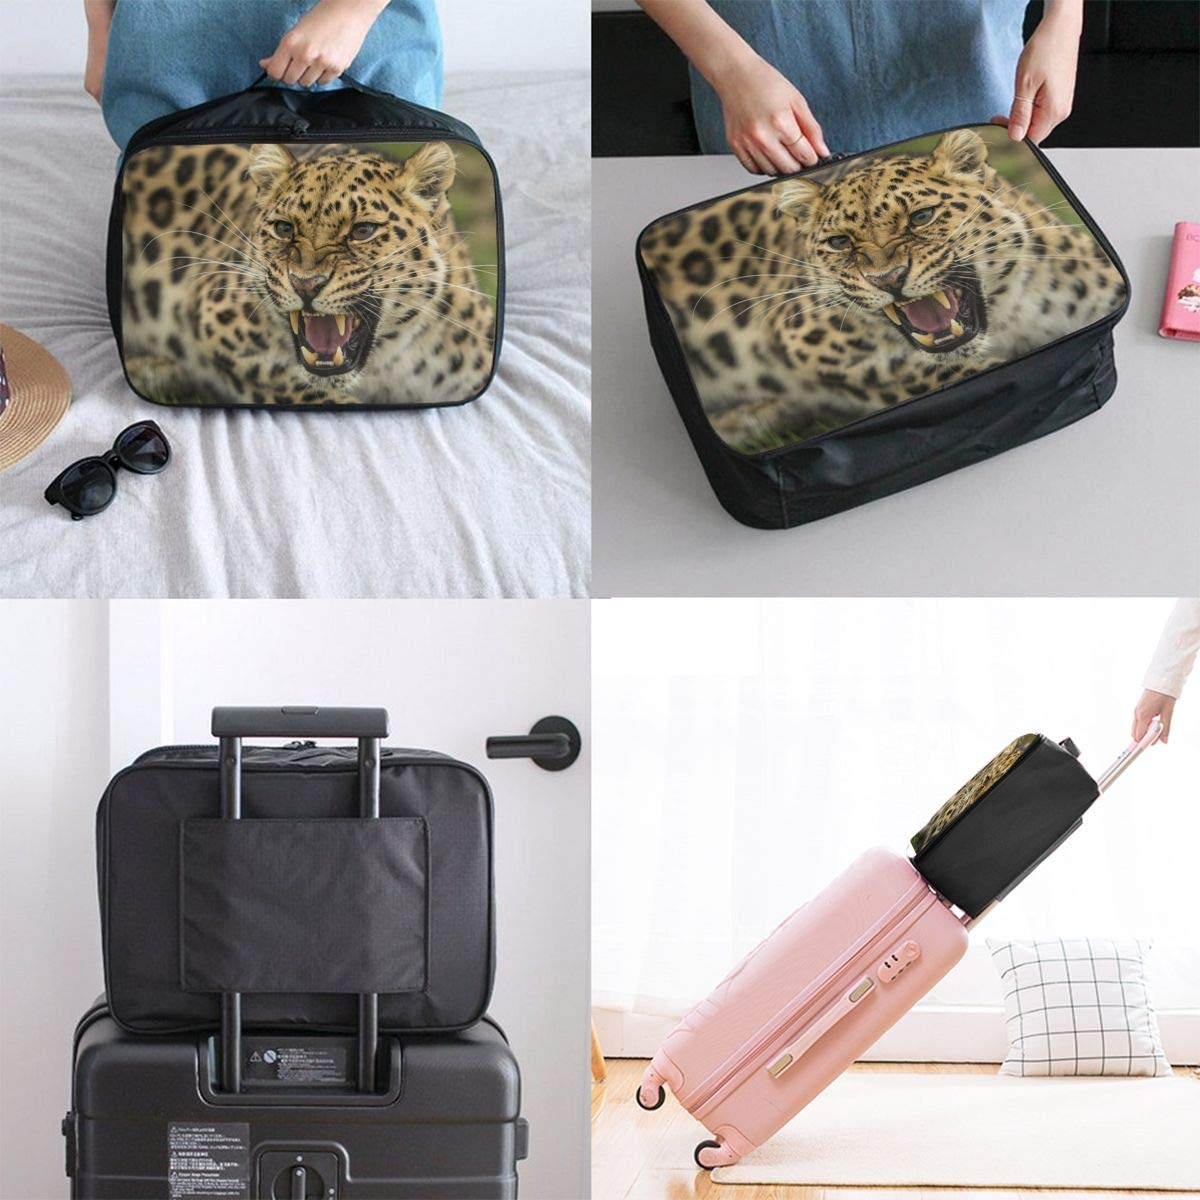 SSZW Leopard Travel Duffel Bag Waterproof Fashion Lightweight Large Capacity Portable Luggage Bag